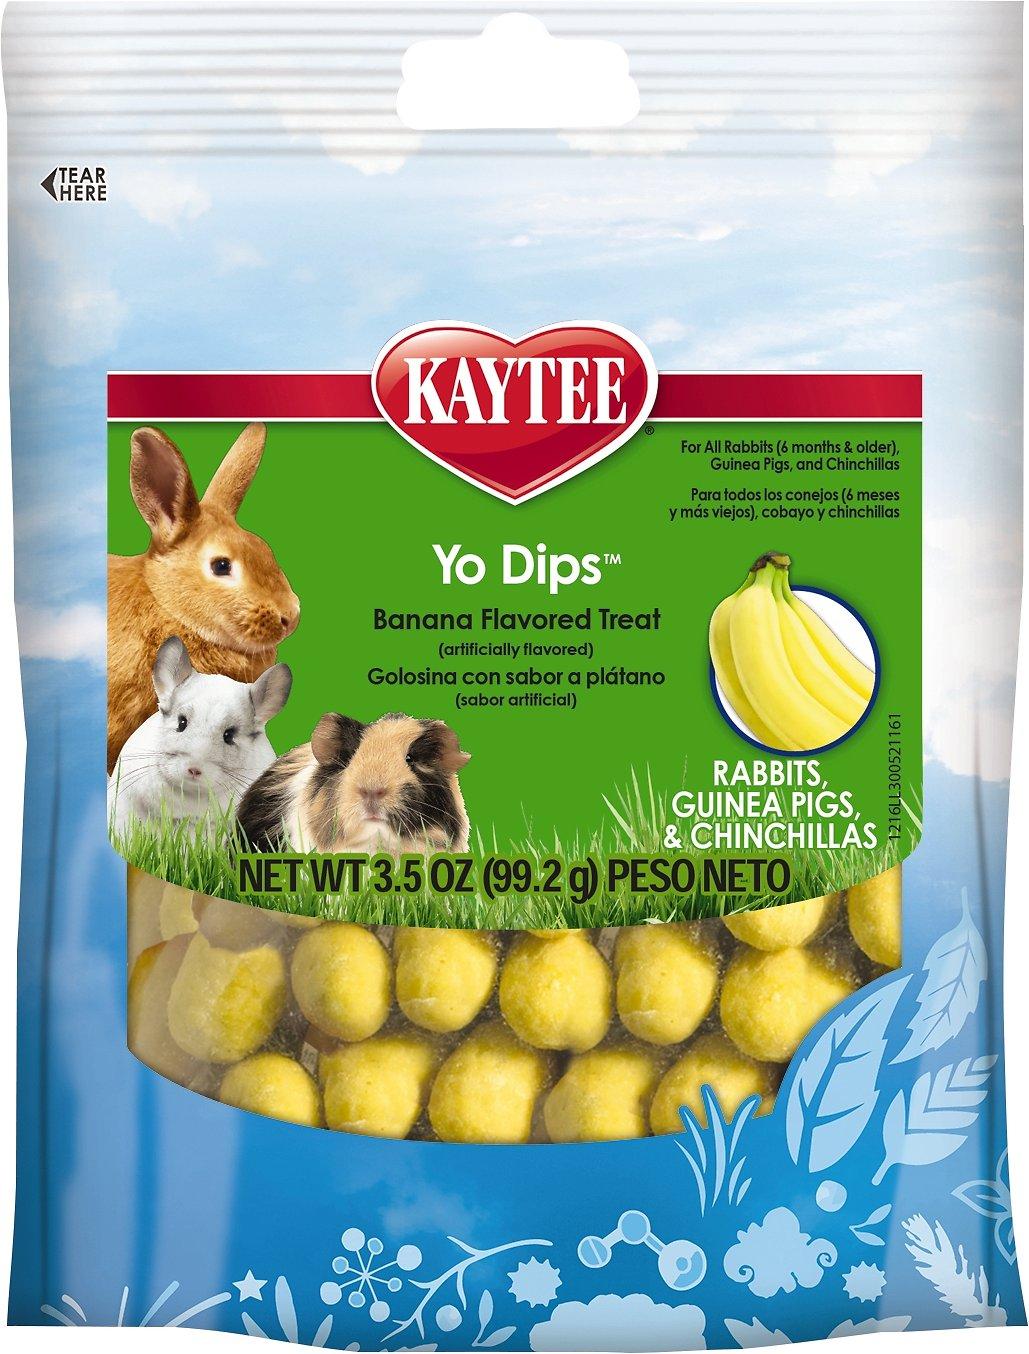 Kaytee Fiesta Banana Flavored Yogurt Dipped Rabbit, Guinea Pig & Chinchilla Treats, 3.5-oz bag